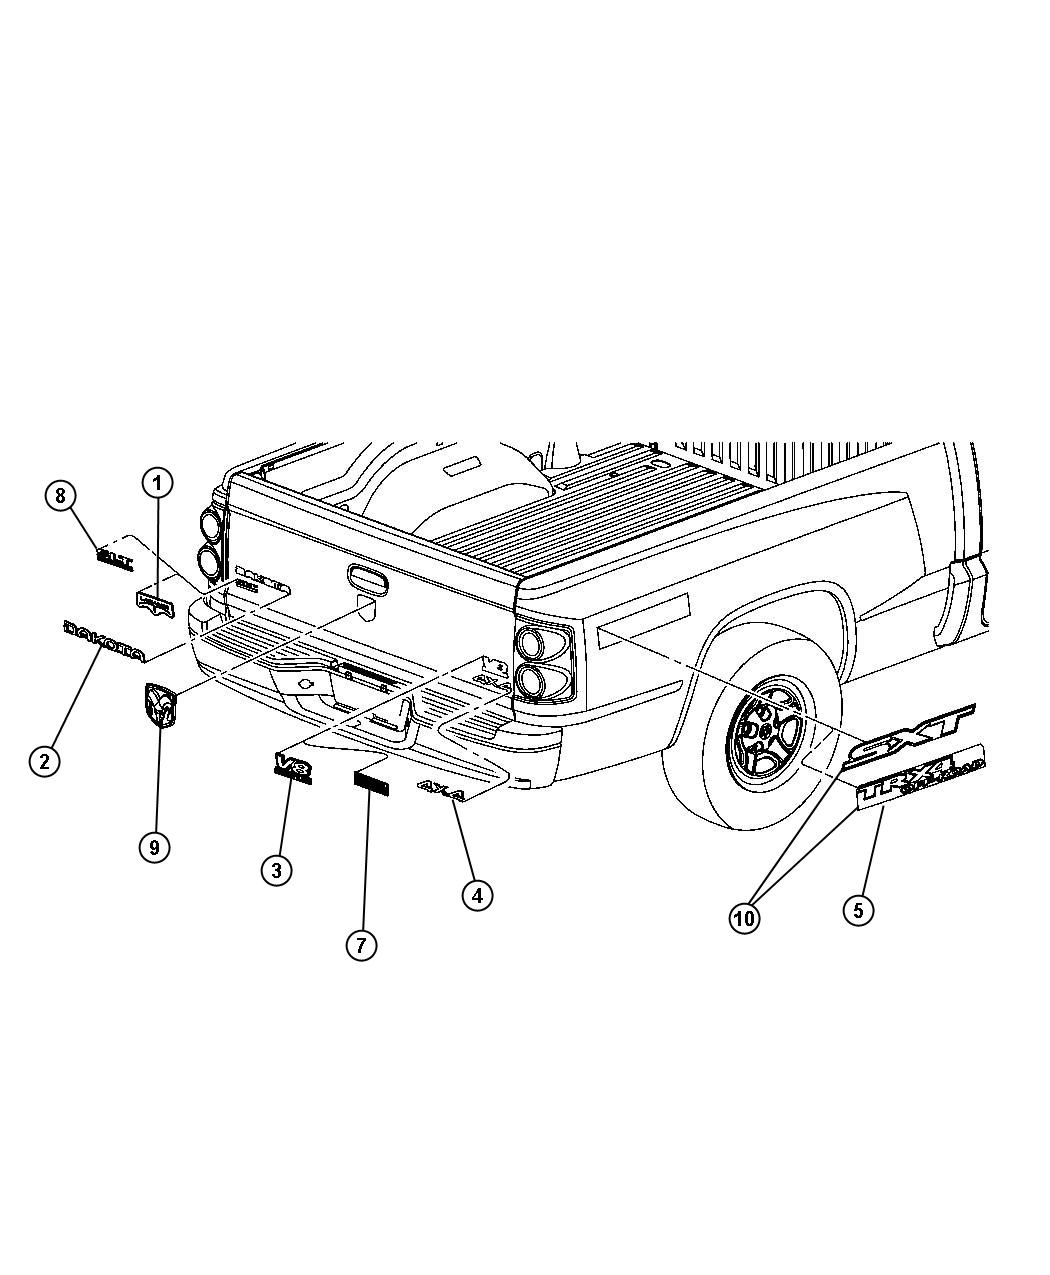 Dodge Dakota Decal Sxt Sxt Badge Nameplates Box